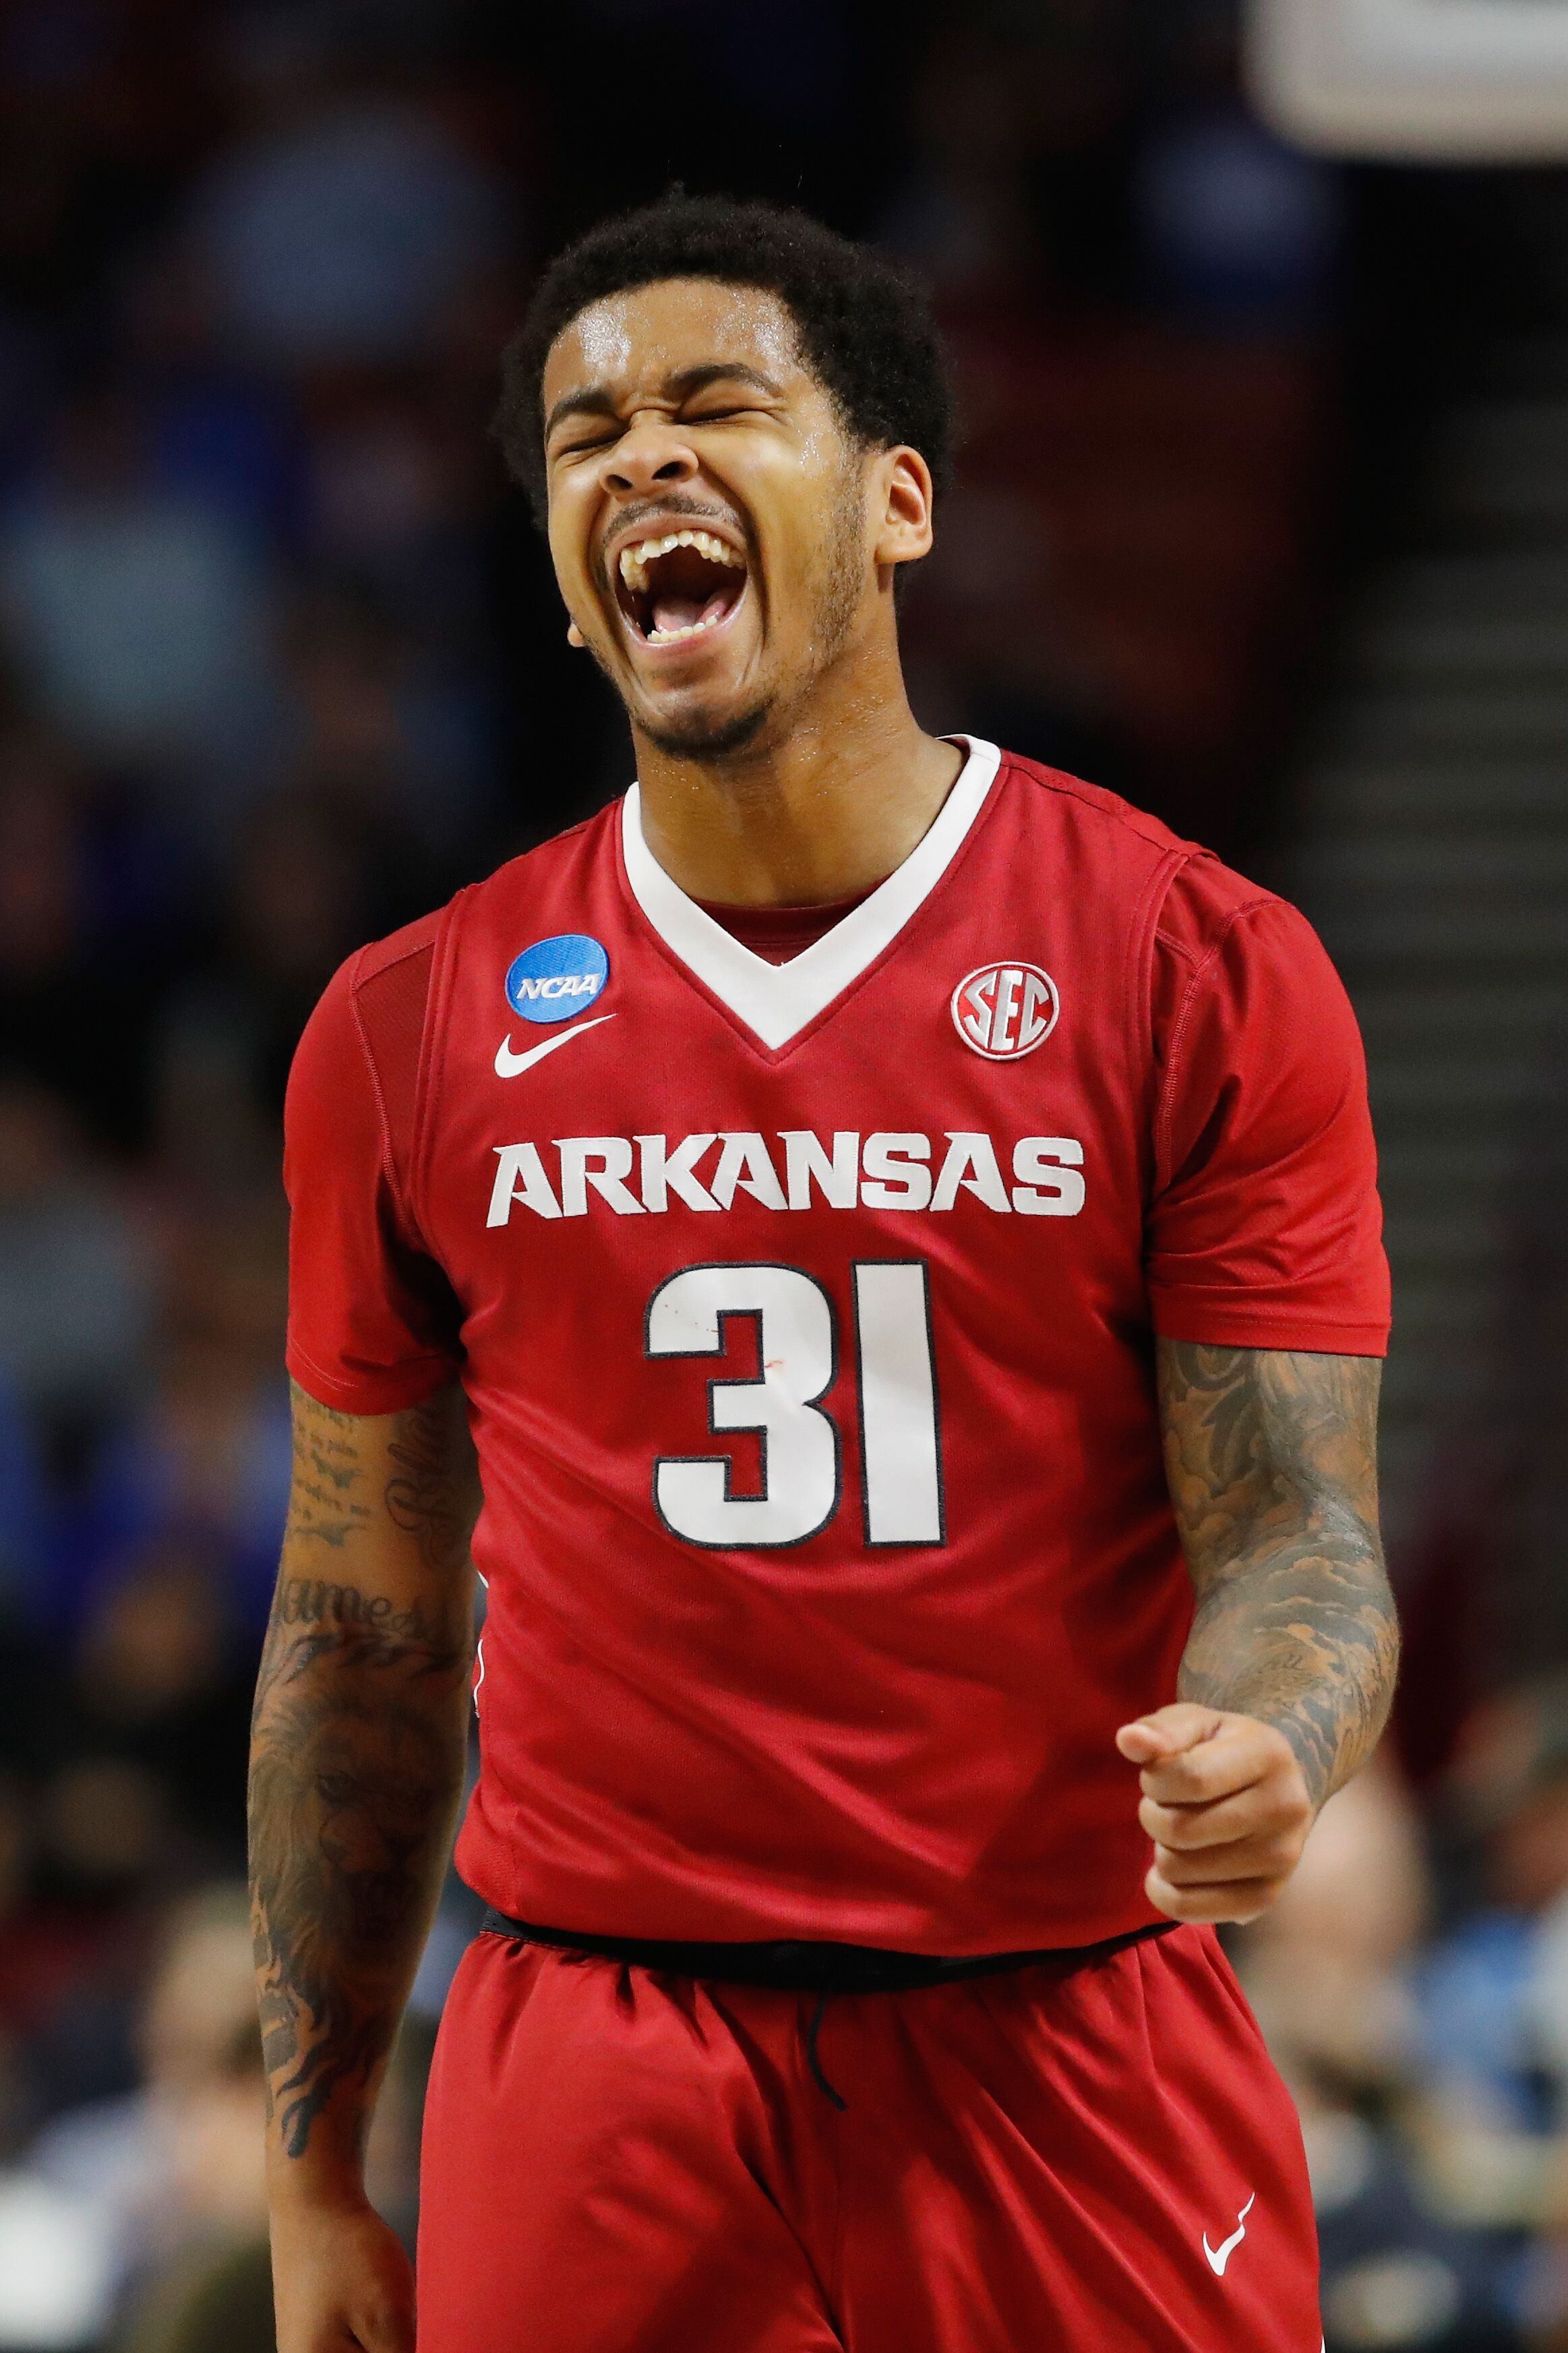 Arkansas Basketball: Razorbacks now with top recruiting